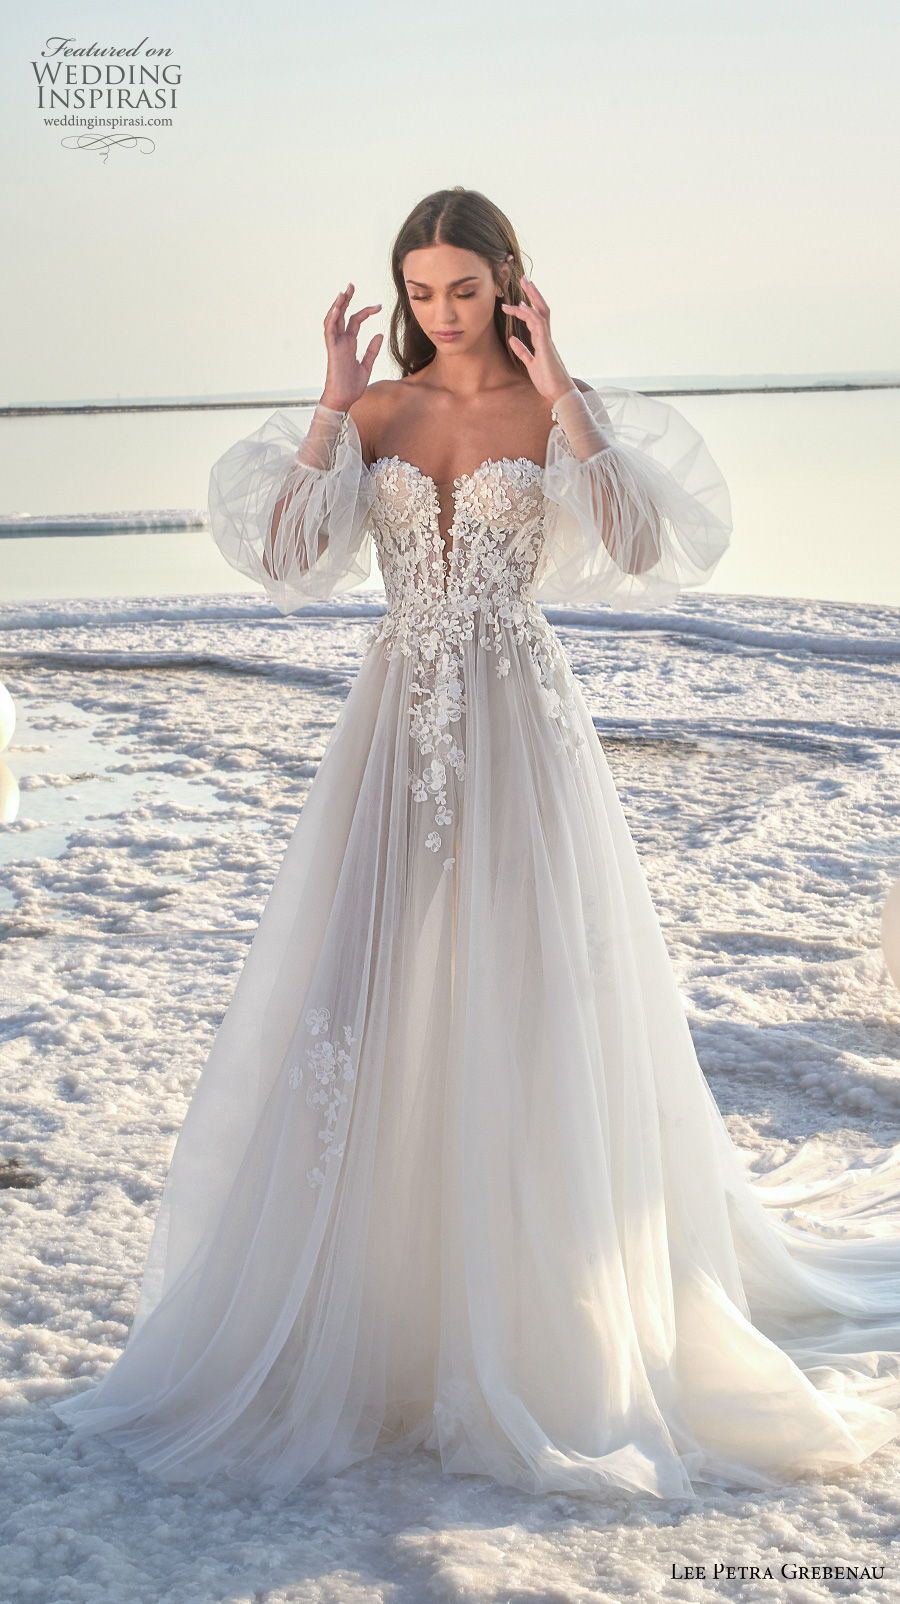 Lee Petra Grebenau 2020 Wedding Dresses Fields Of Pearls Bridal Collection Wedding Inspirasi Summer Wedding Dress Lace Beach Wedding Dress Wedding Dresses [ 1604 x 900 Pixel ]